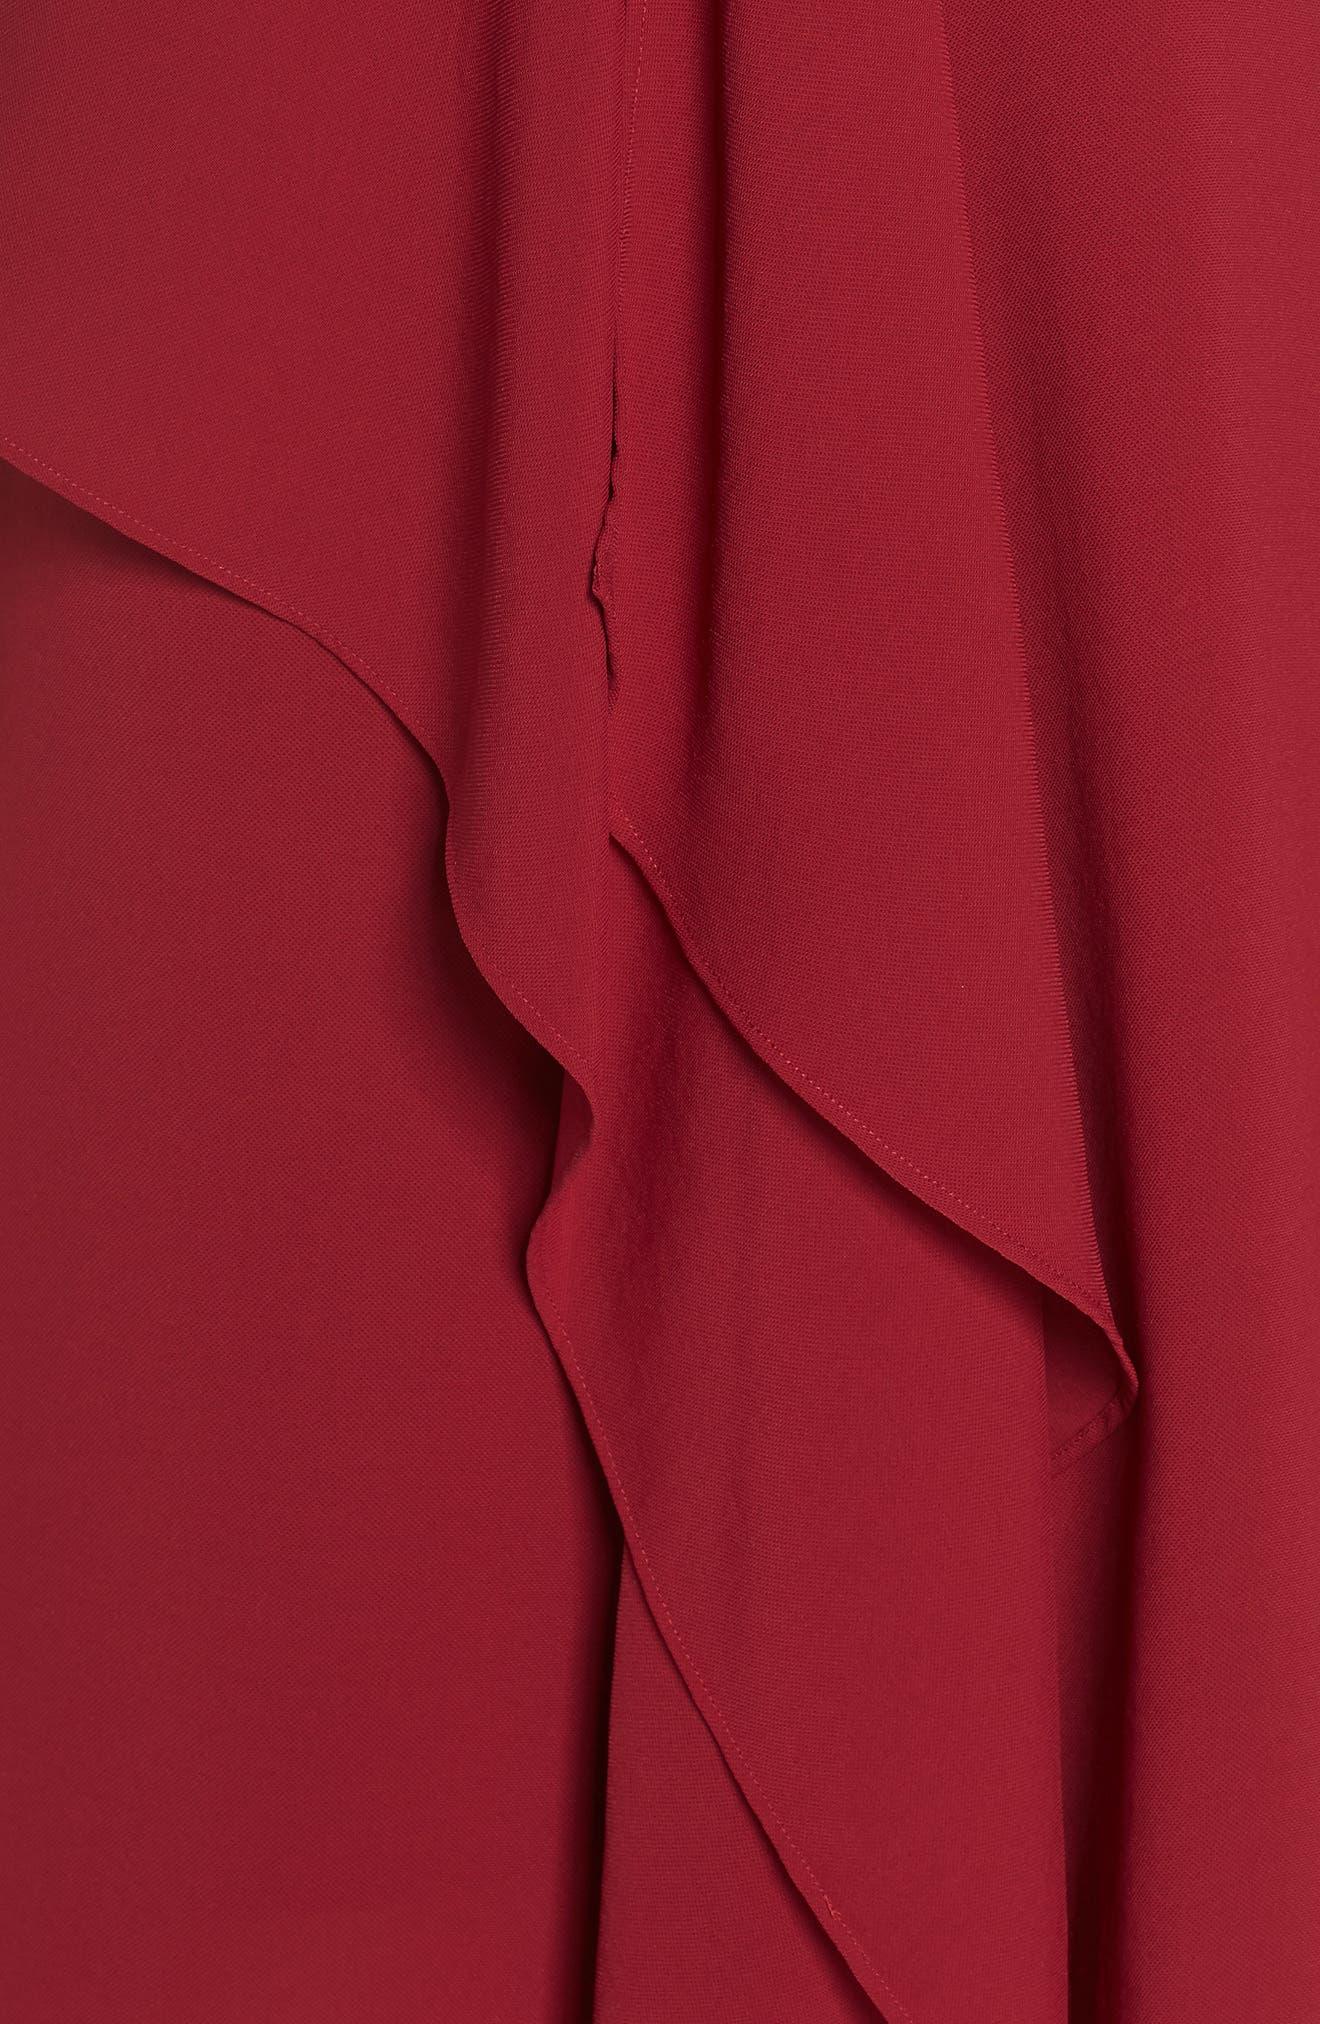 Ruffle Front Crepe High/Low Dress,                             Alternate thumbnail 6, color,                             Alizarin Crimson